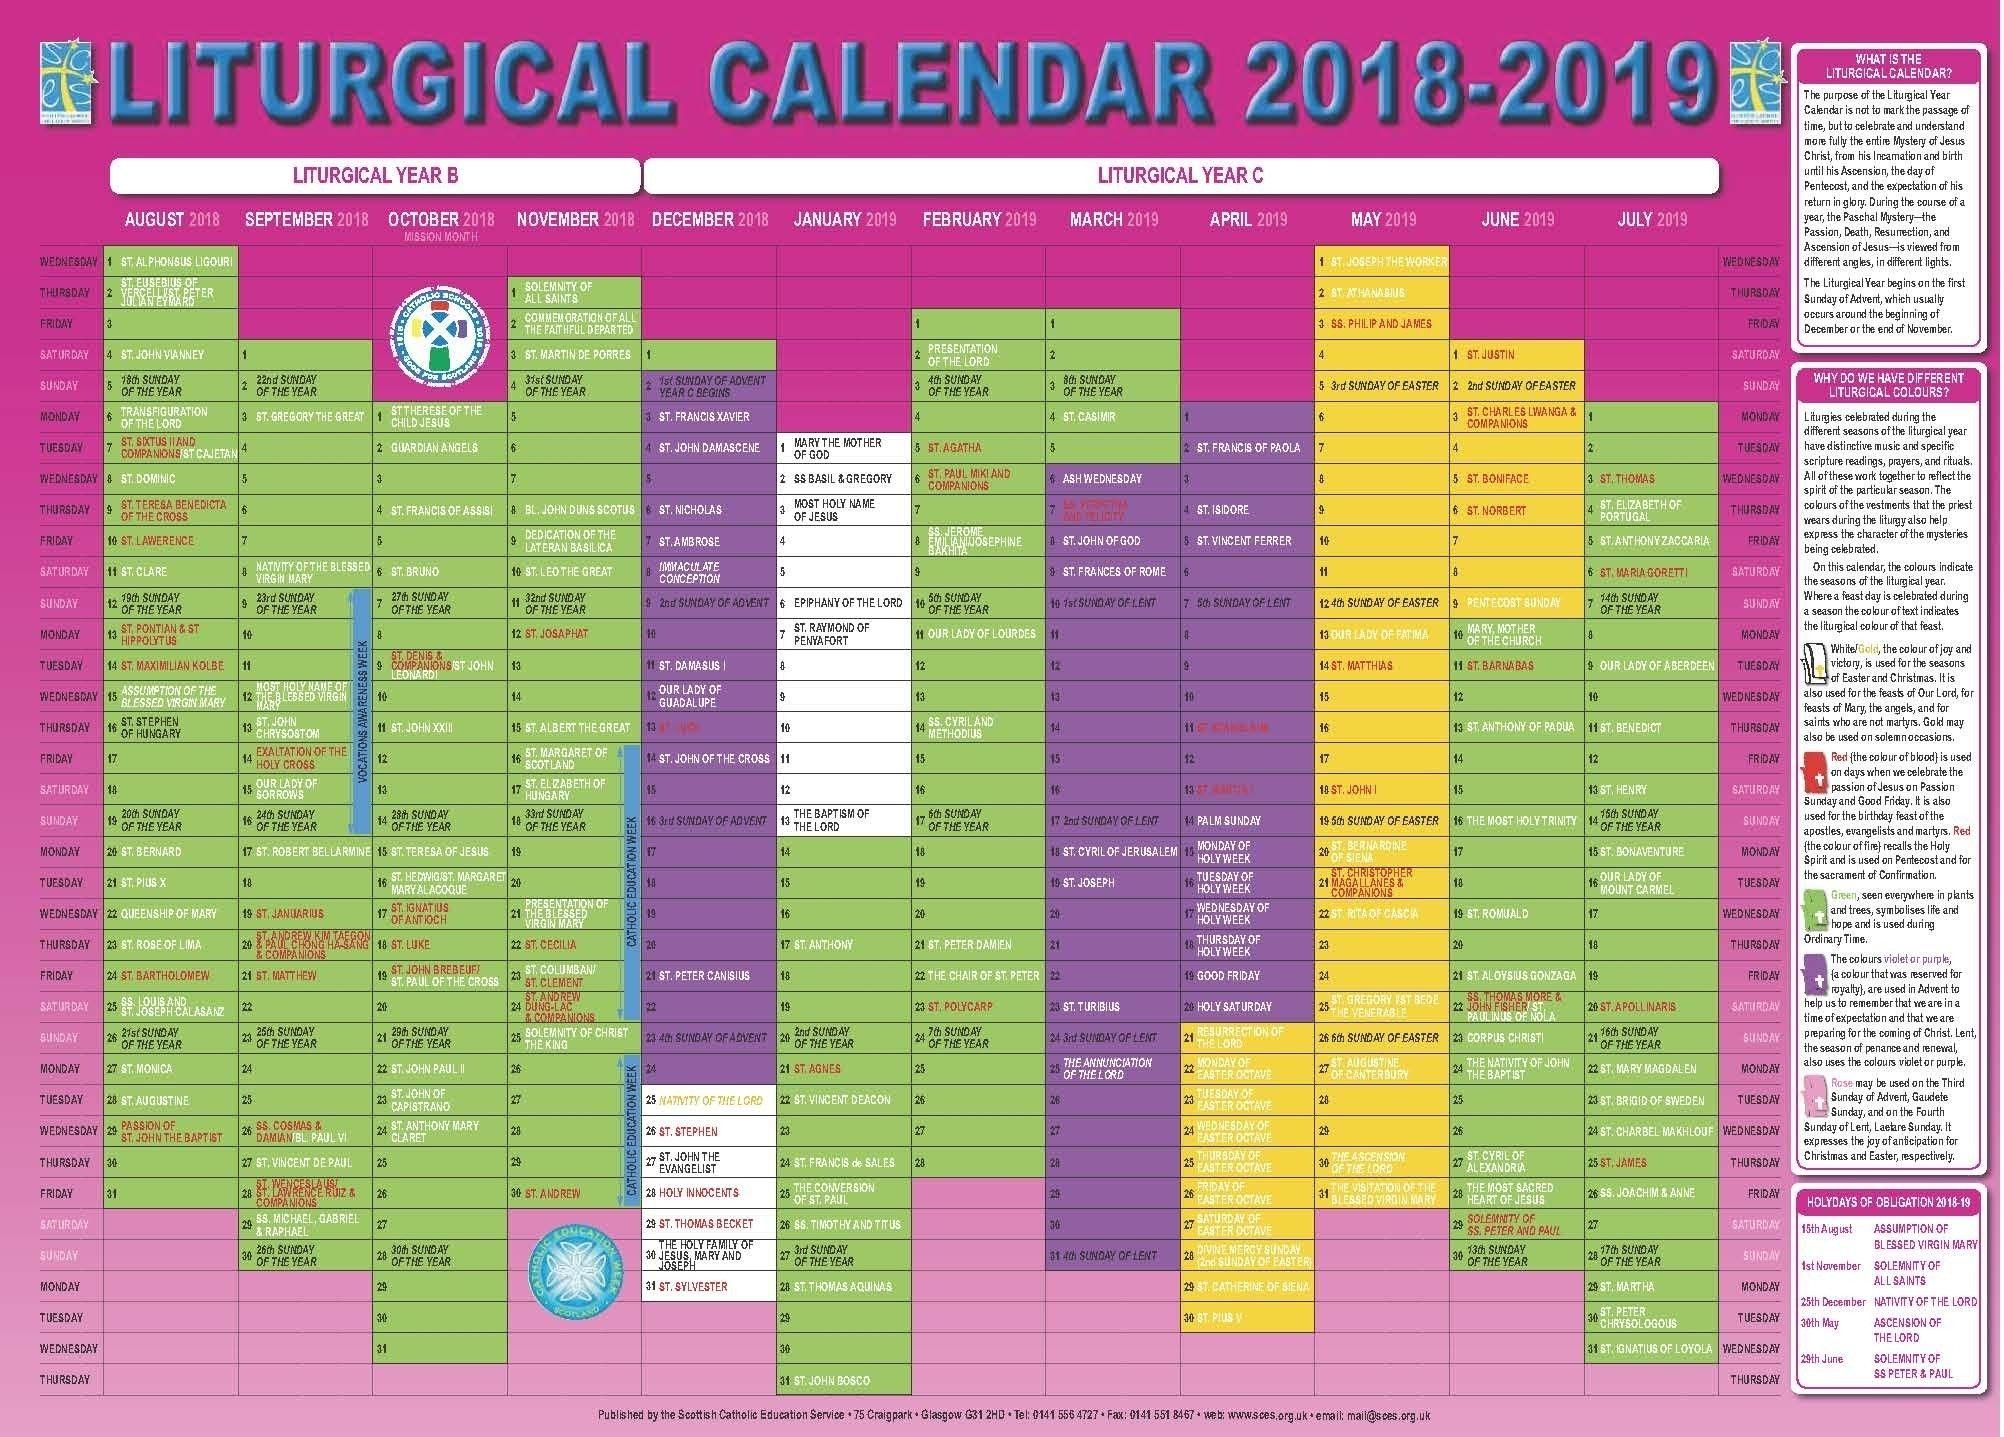 Free Printable Liturgical Calendar | Catholic Liturgical